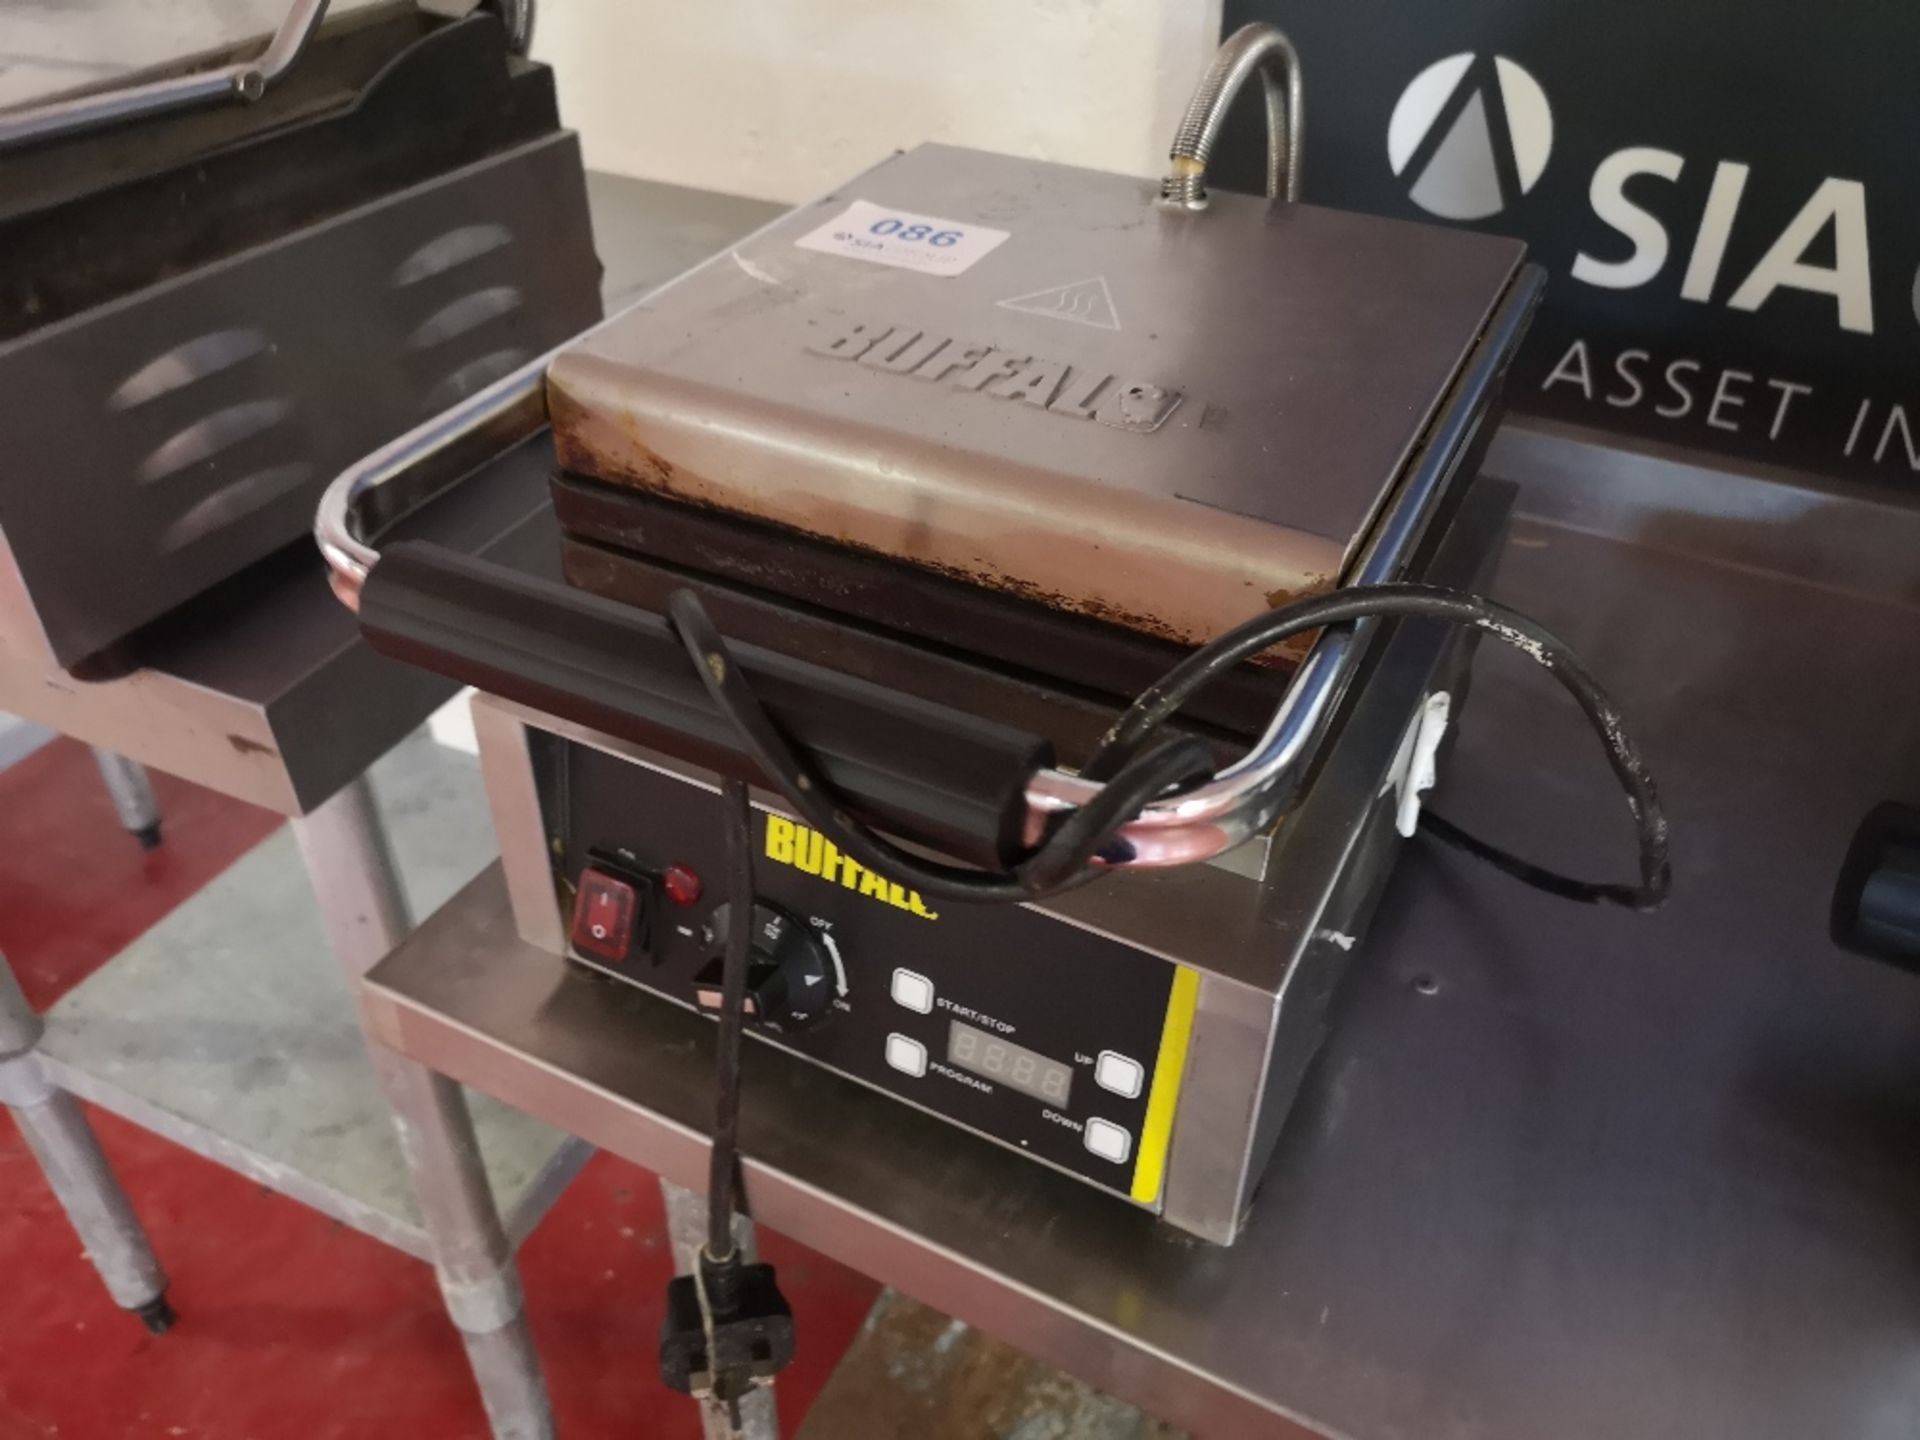 Buffalo GF256-03 Waffle Maker - Image 3 of 5